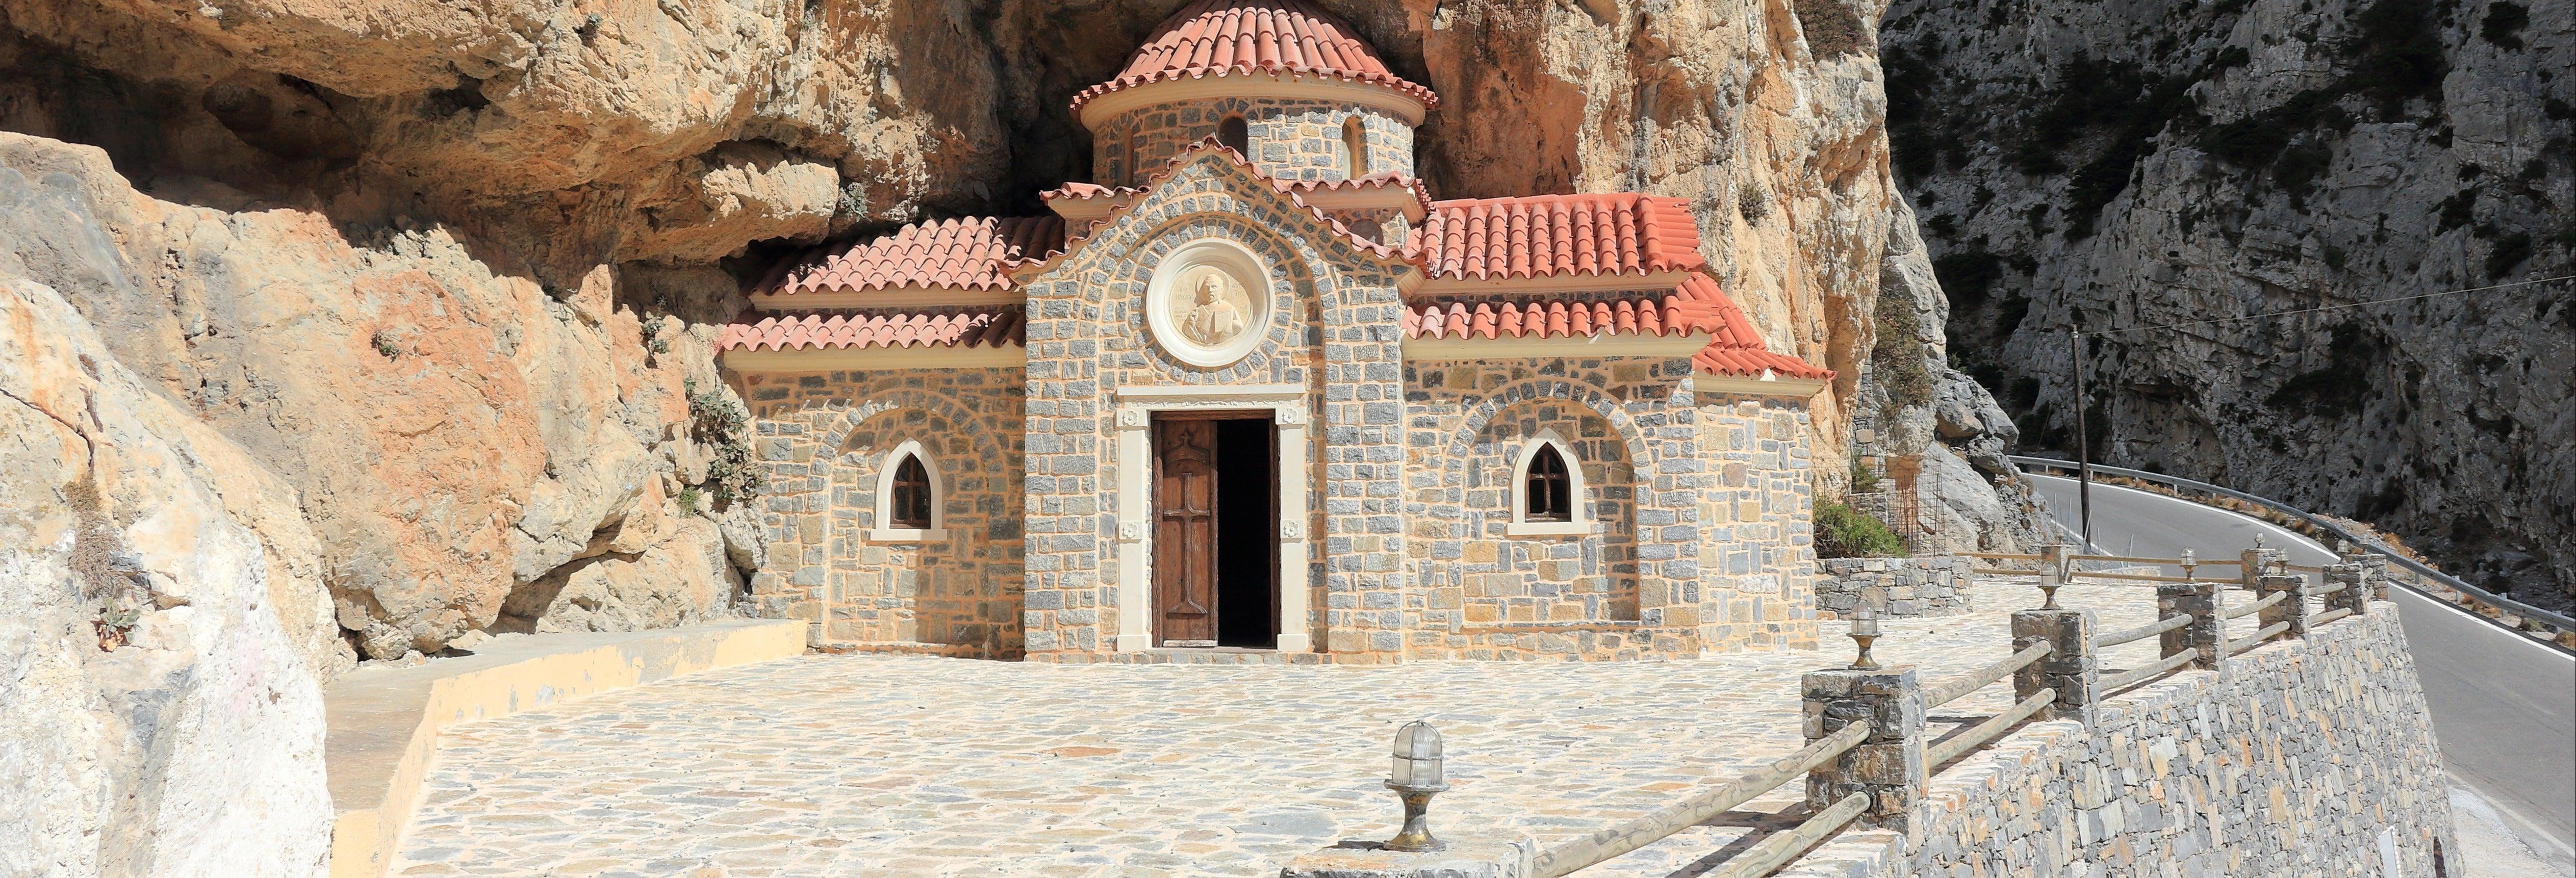 Central Crete + Kournas Lake Day Trip